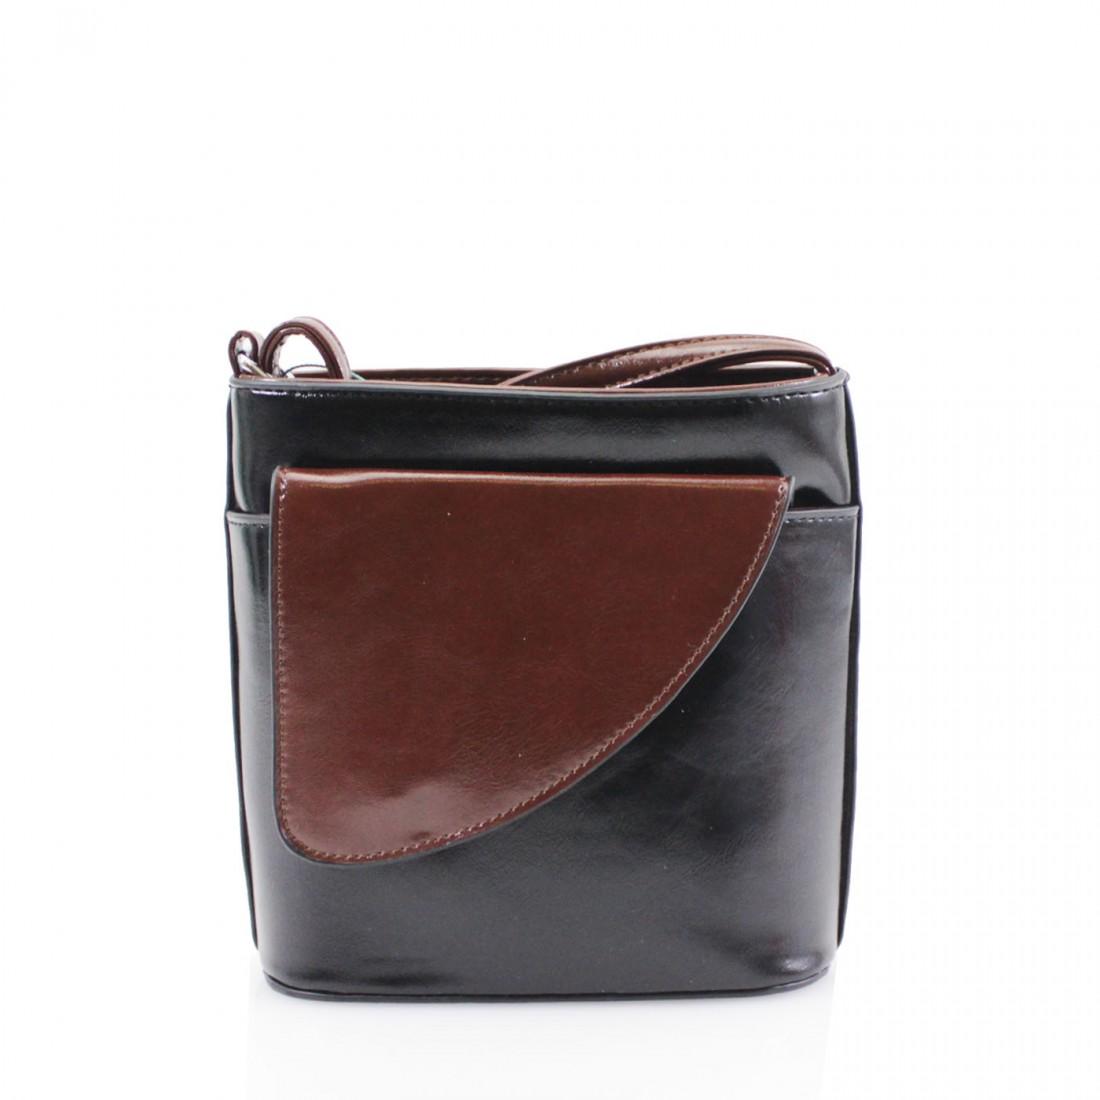 2 Tone Small Cross Body Handbag - Black